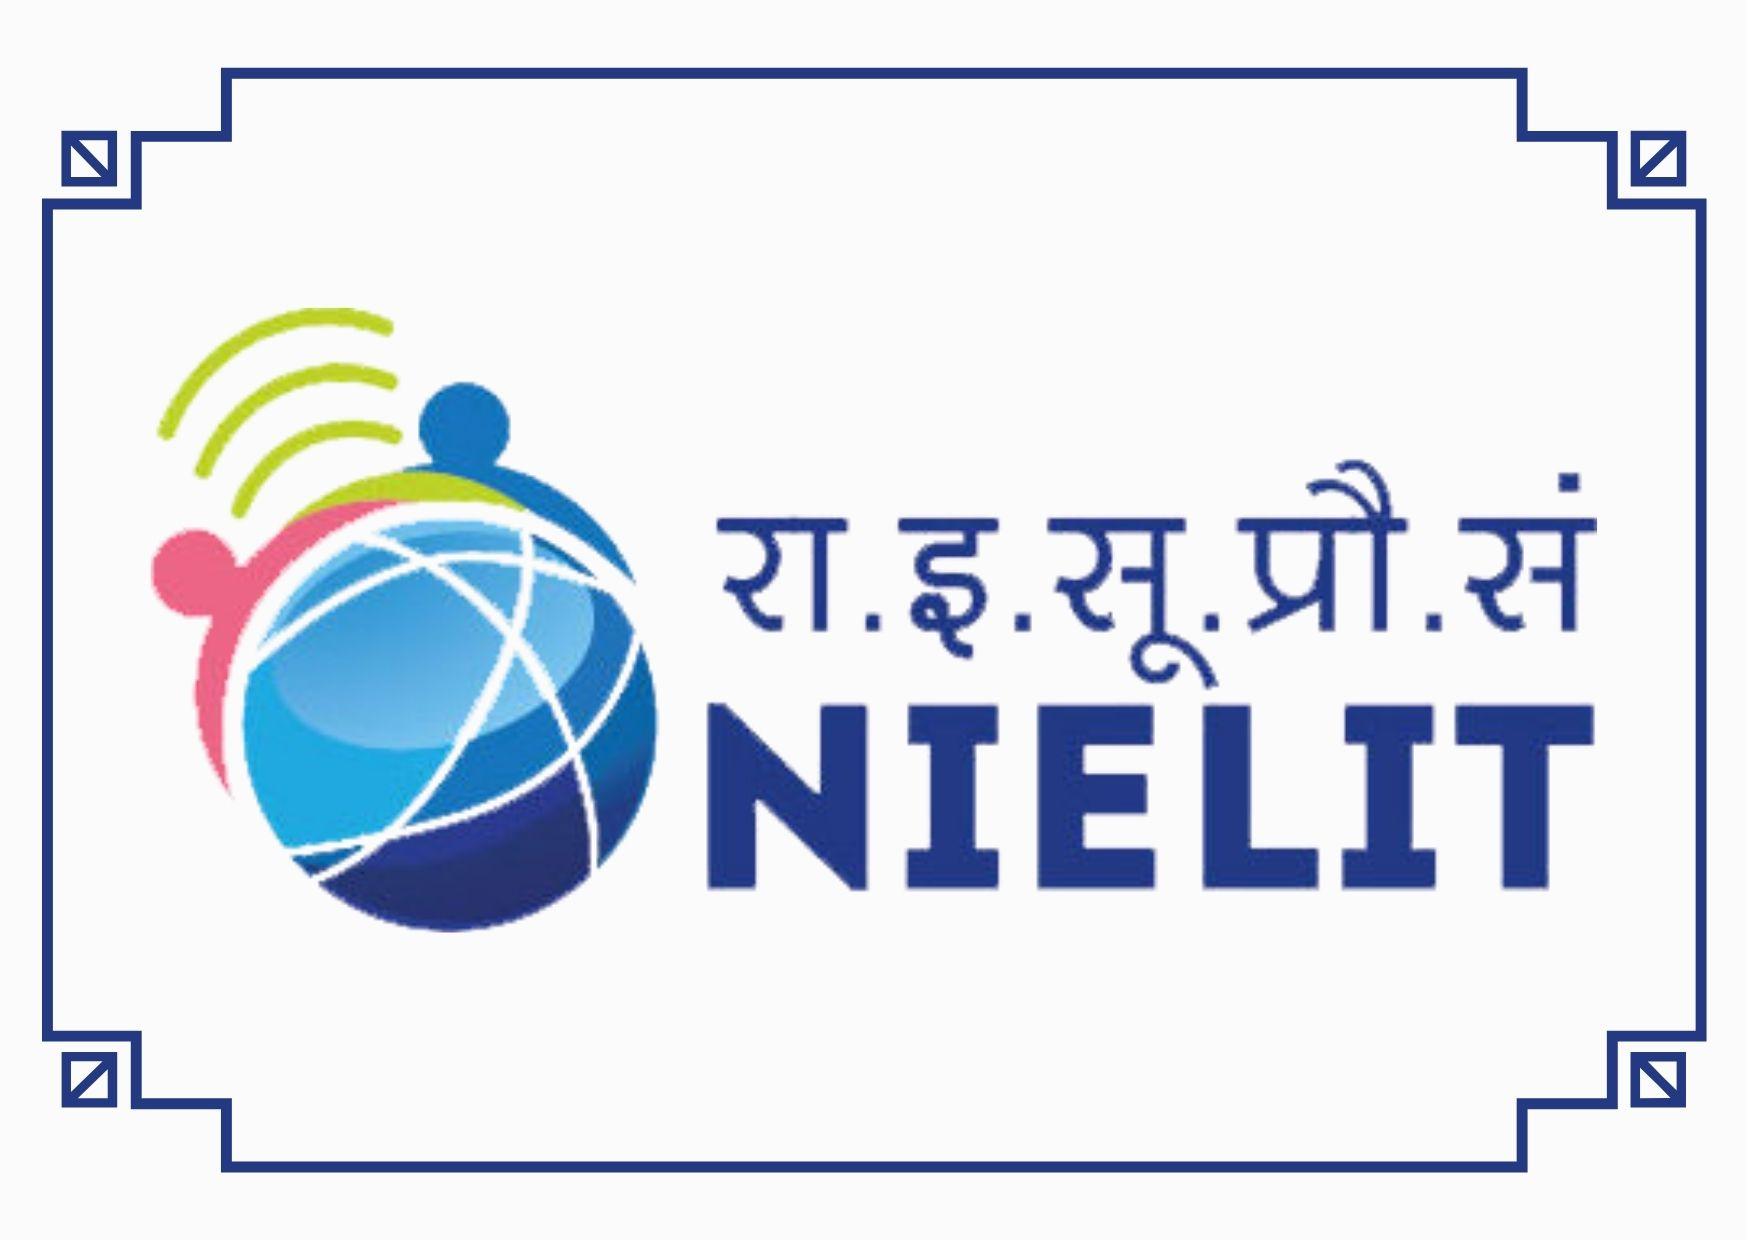 Student NIELIT CCC Online Registration 2021 student.nielit.gov.in